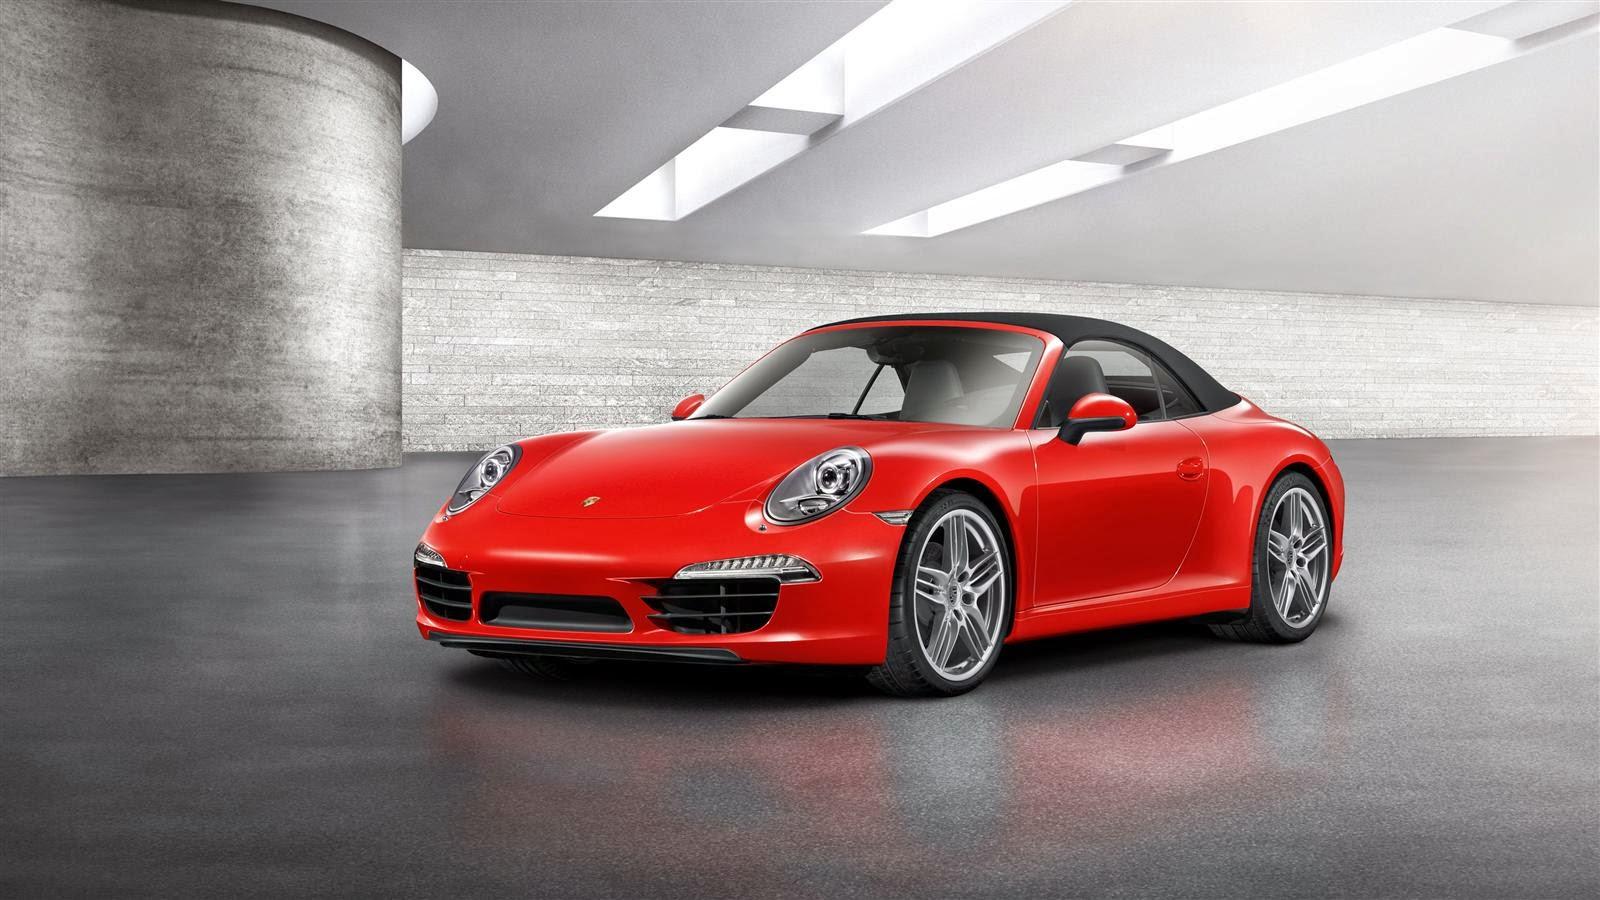 Porsche 911 Carrera Cabriolet Exterior